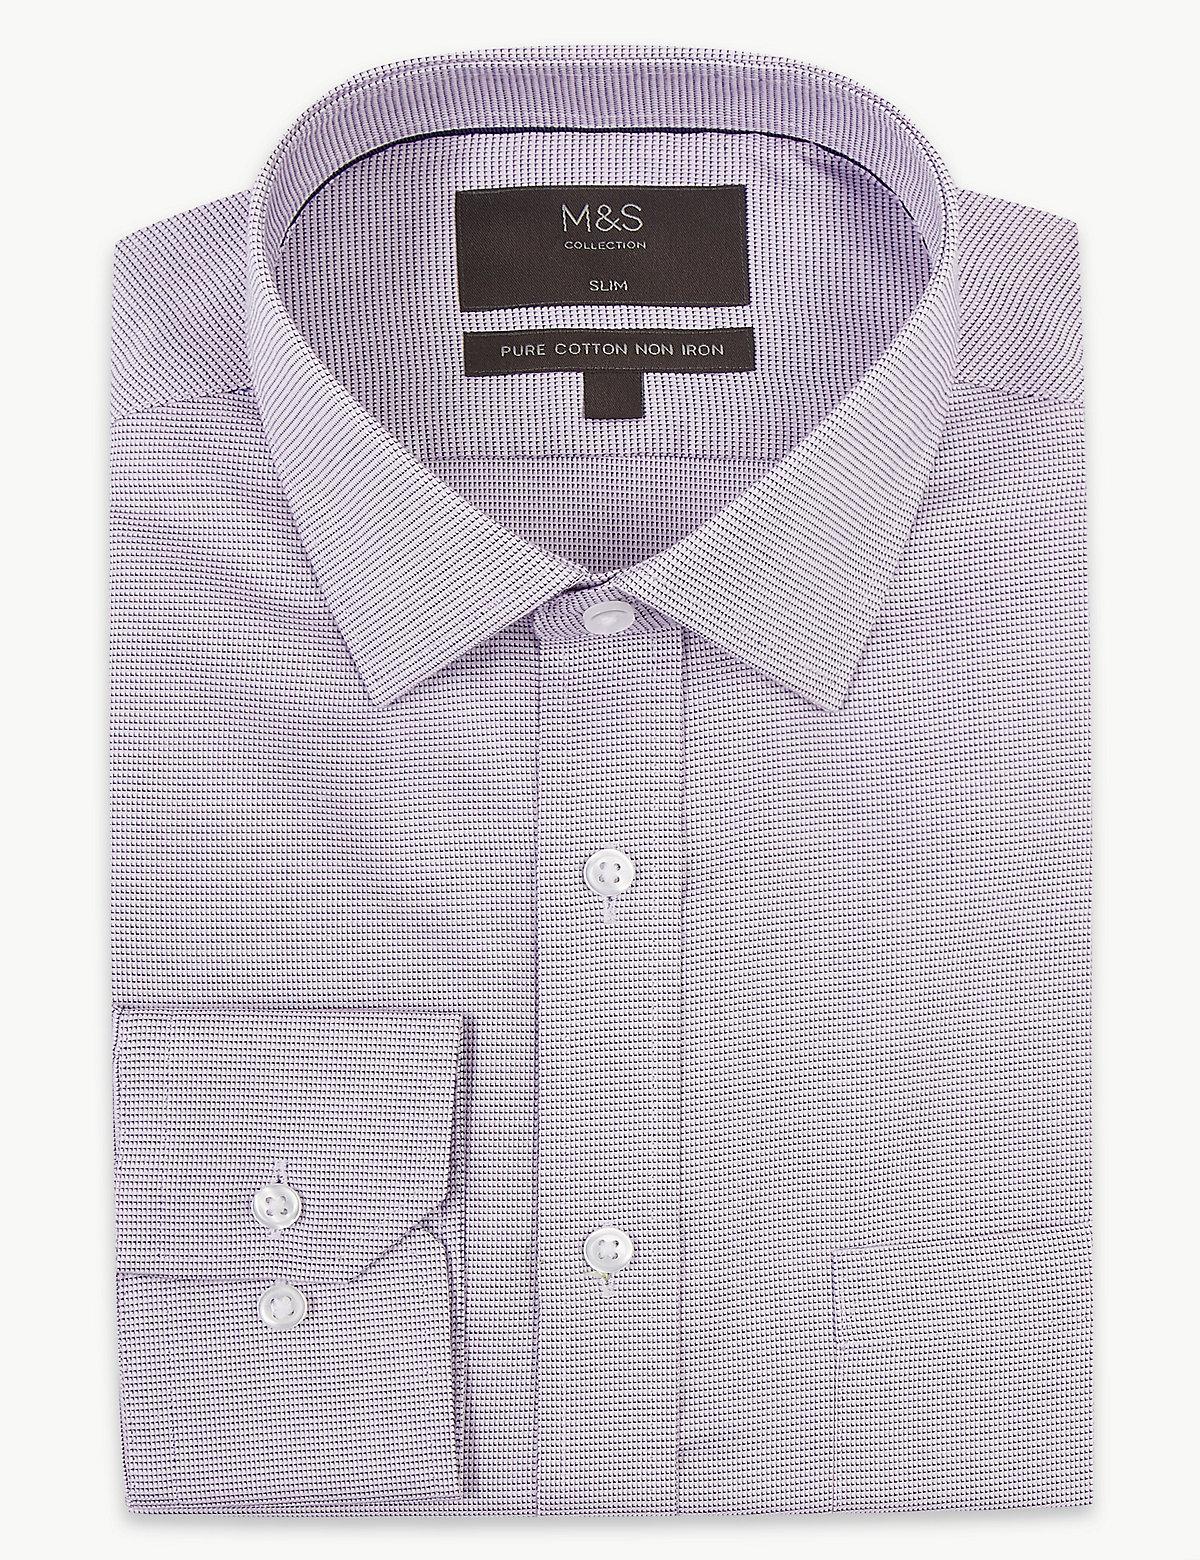 Мужская рубашка Non-Iron из 100%-го хлопка